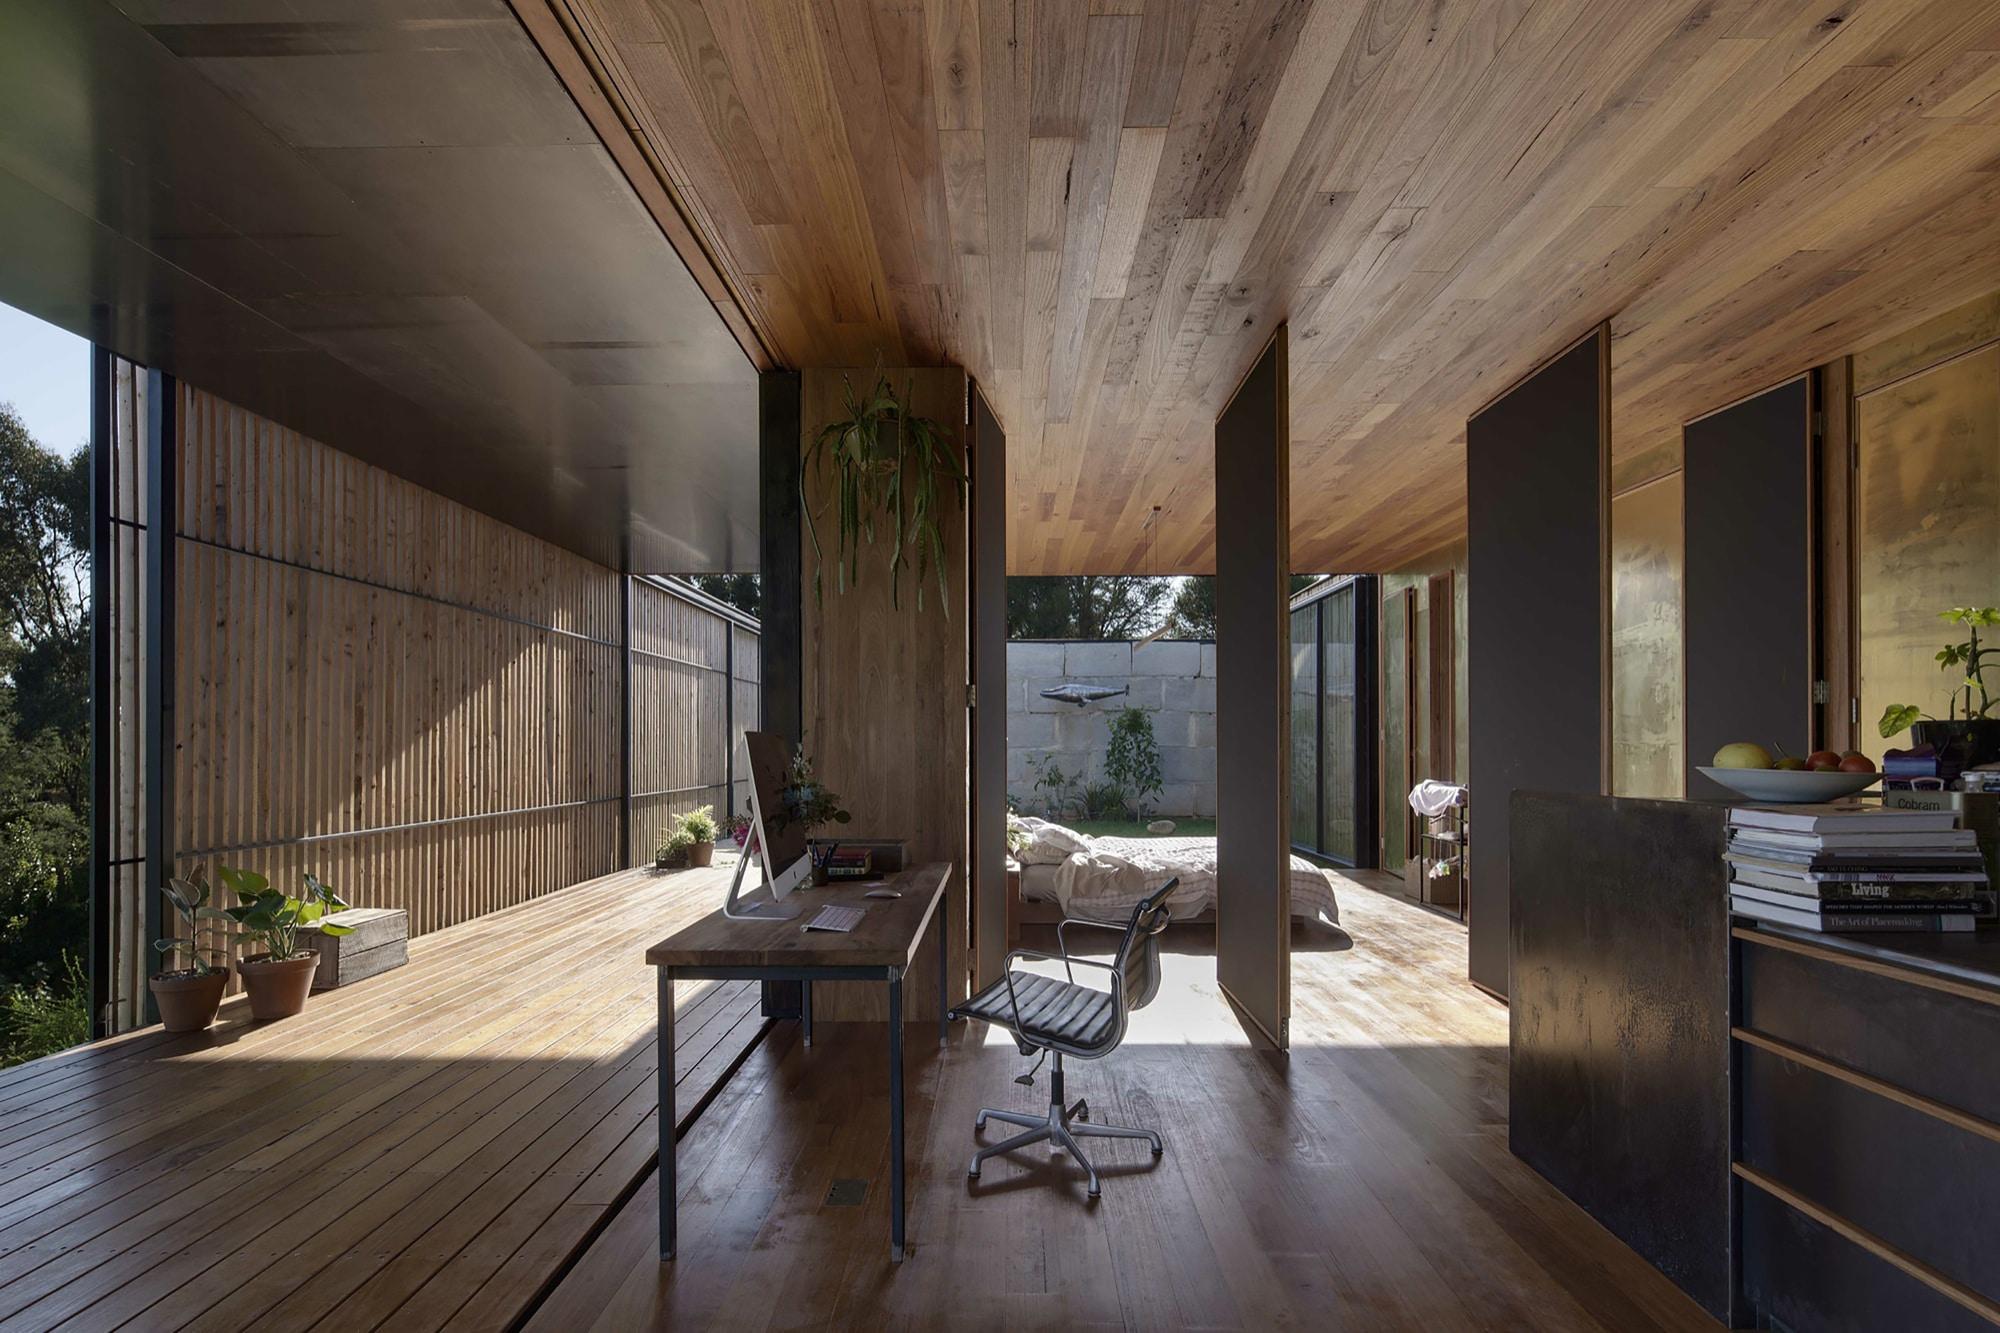 Original casa de campo un piso construye hogar - Disenos de casas rurales ...